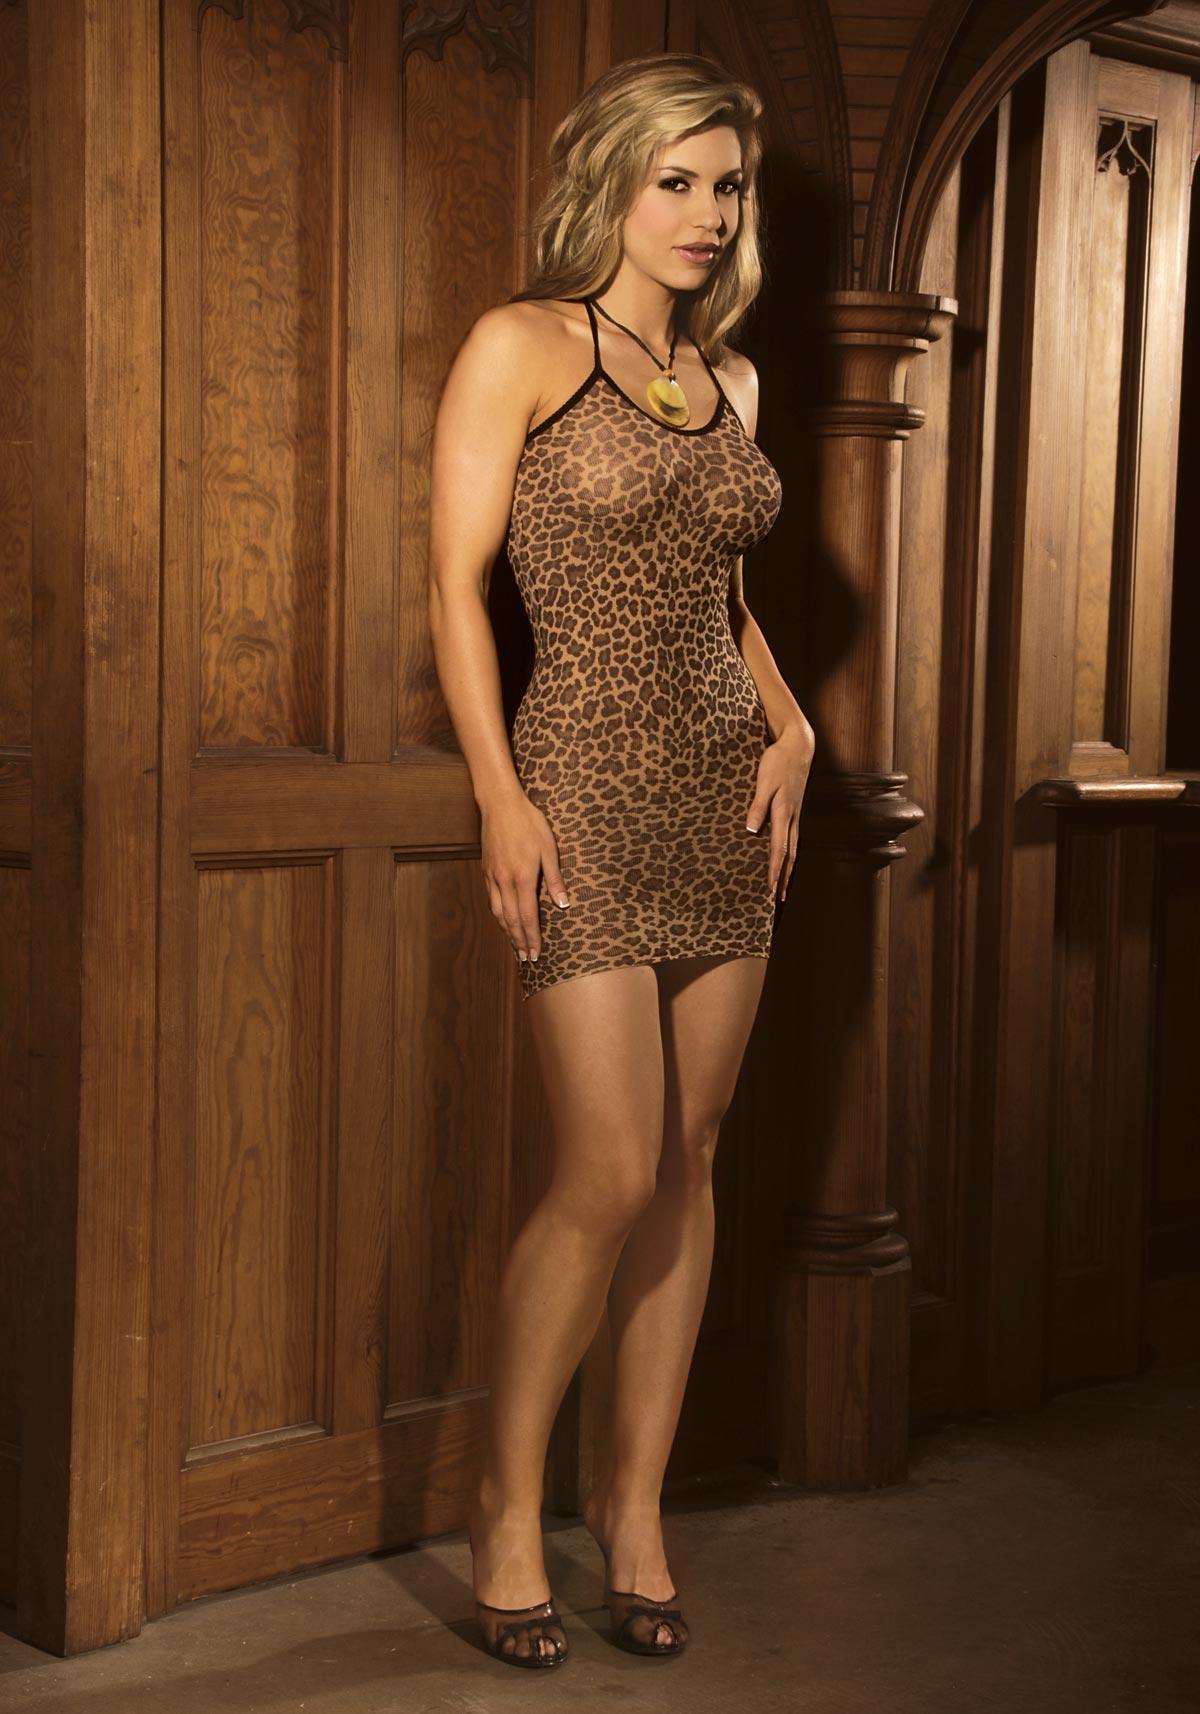 Секси мини платья фото 12 фотография